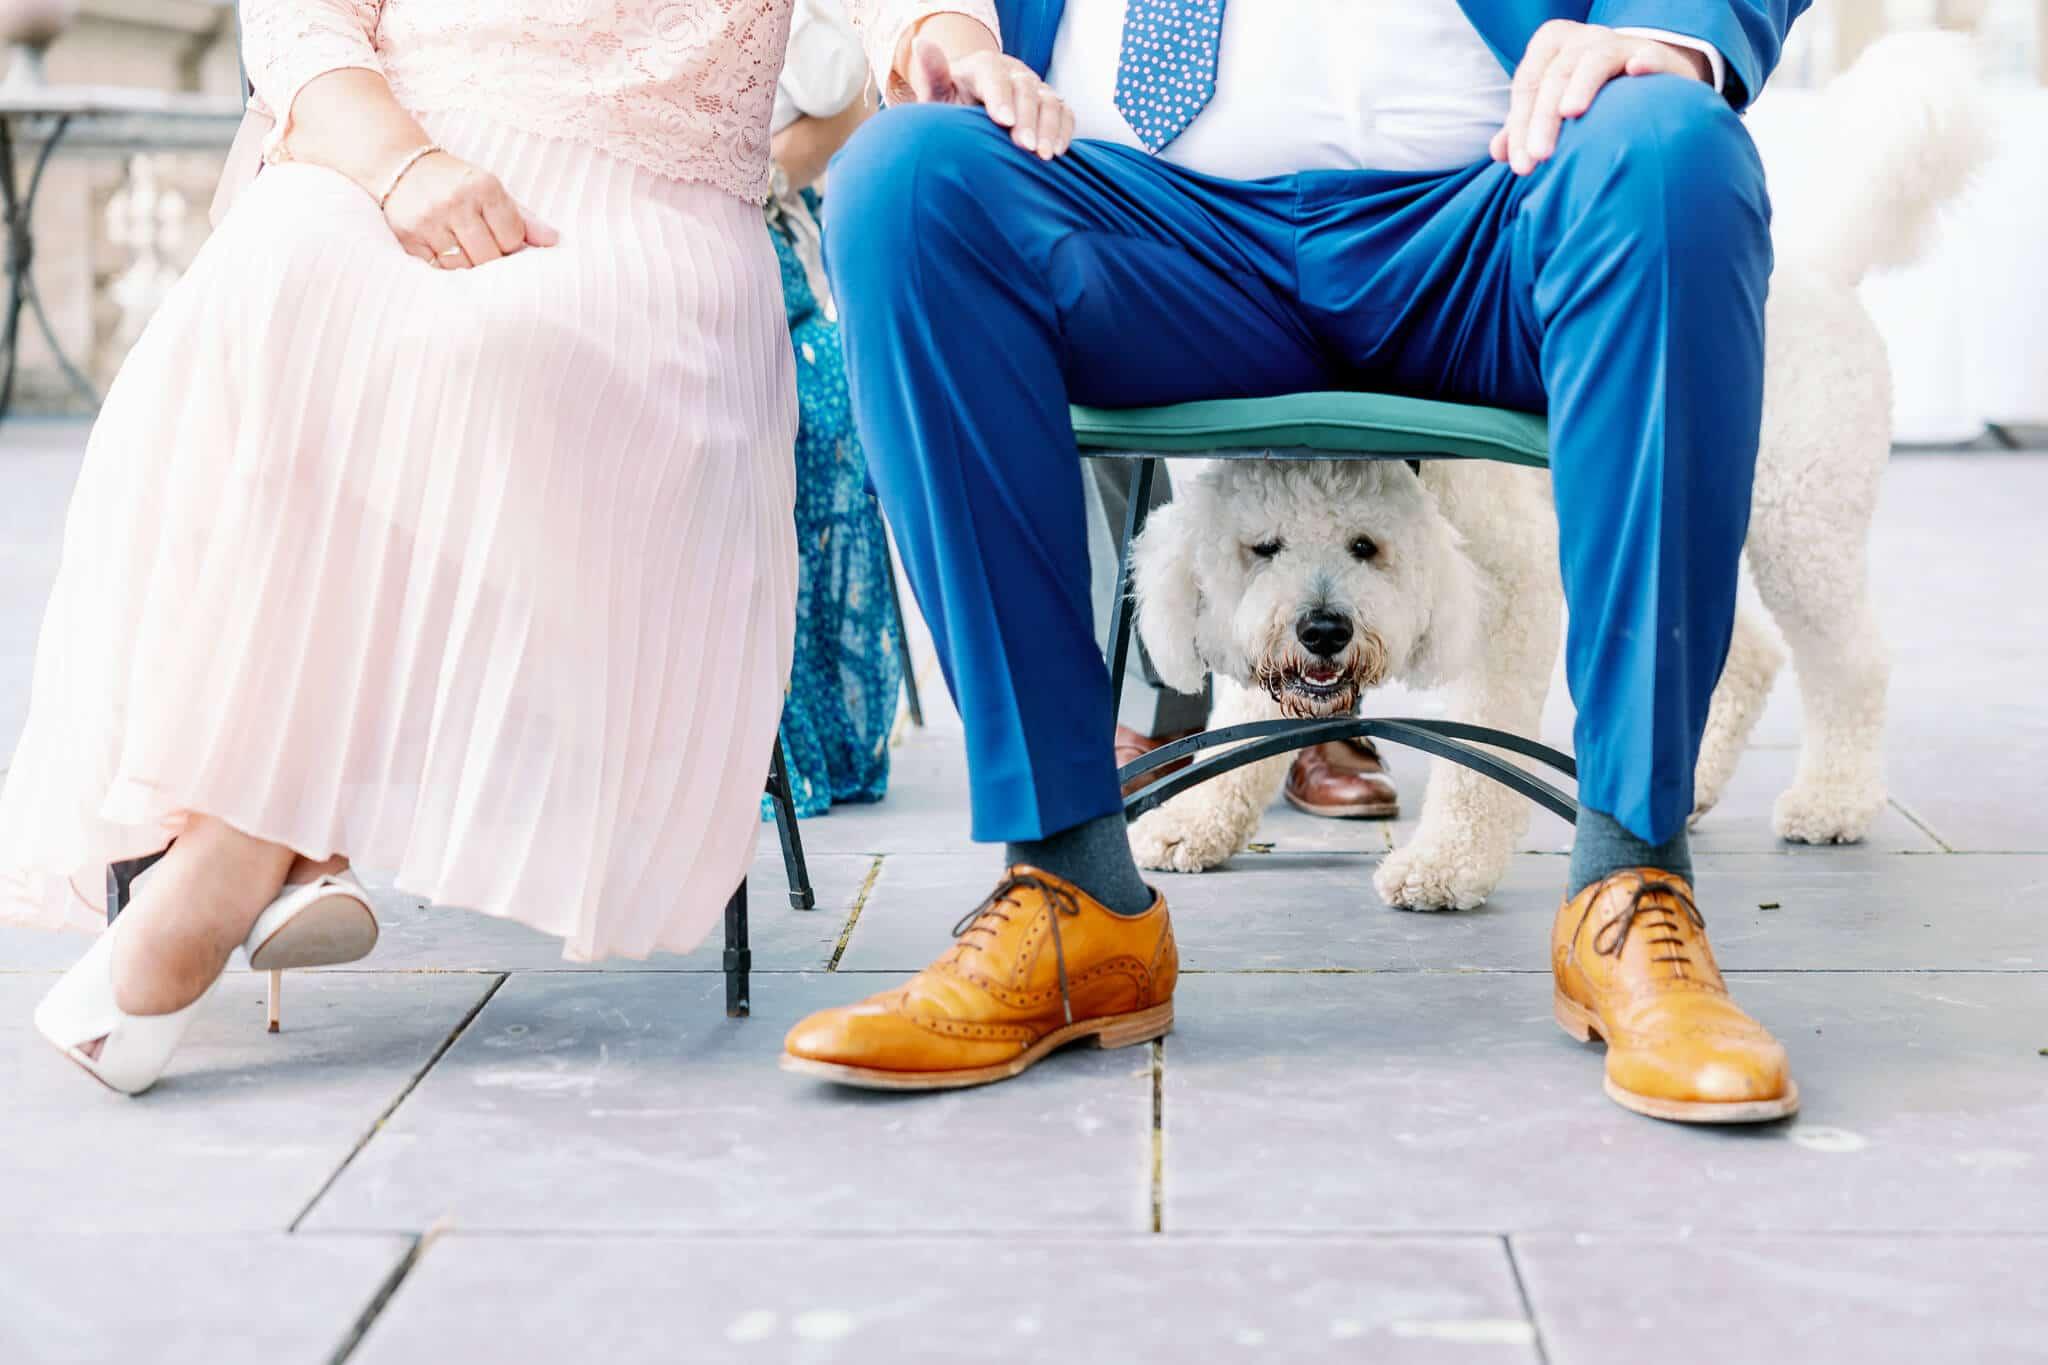 Dog-friendly ceremony wedding venue in London | Wedding Photography in West London